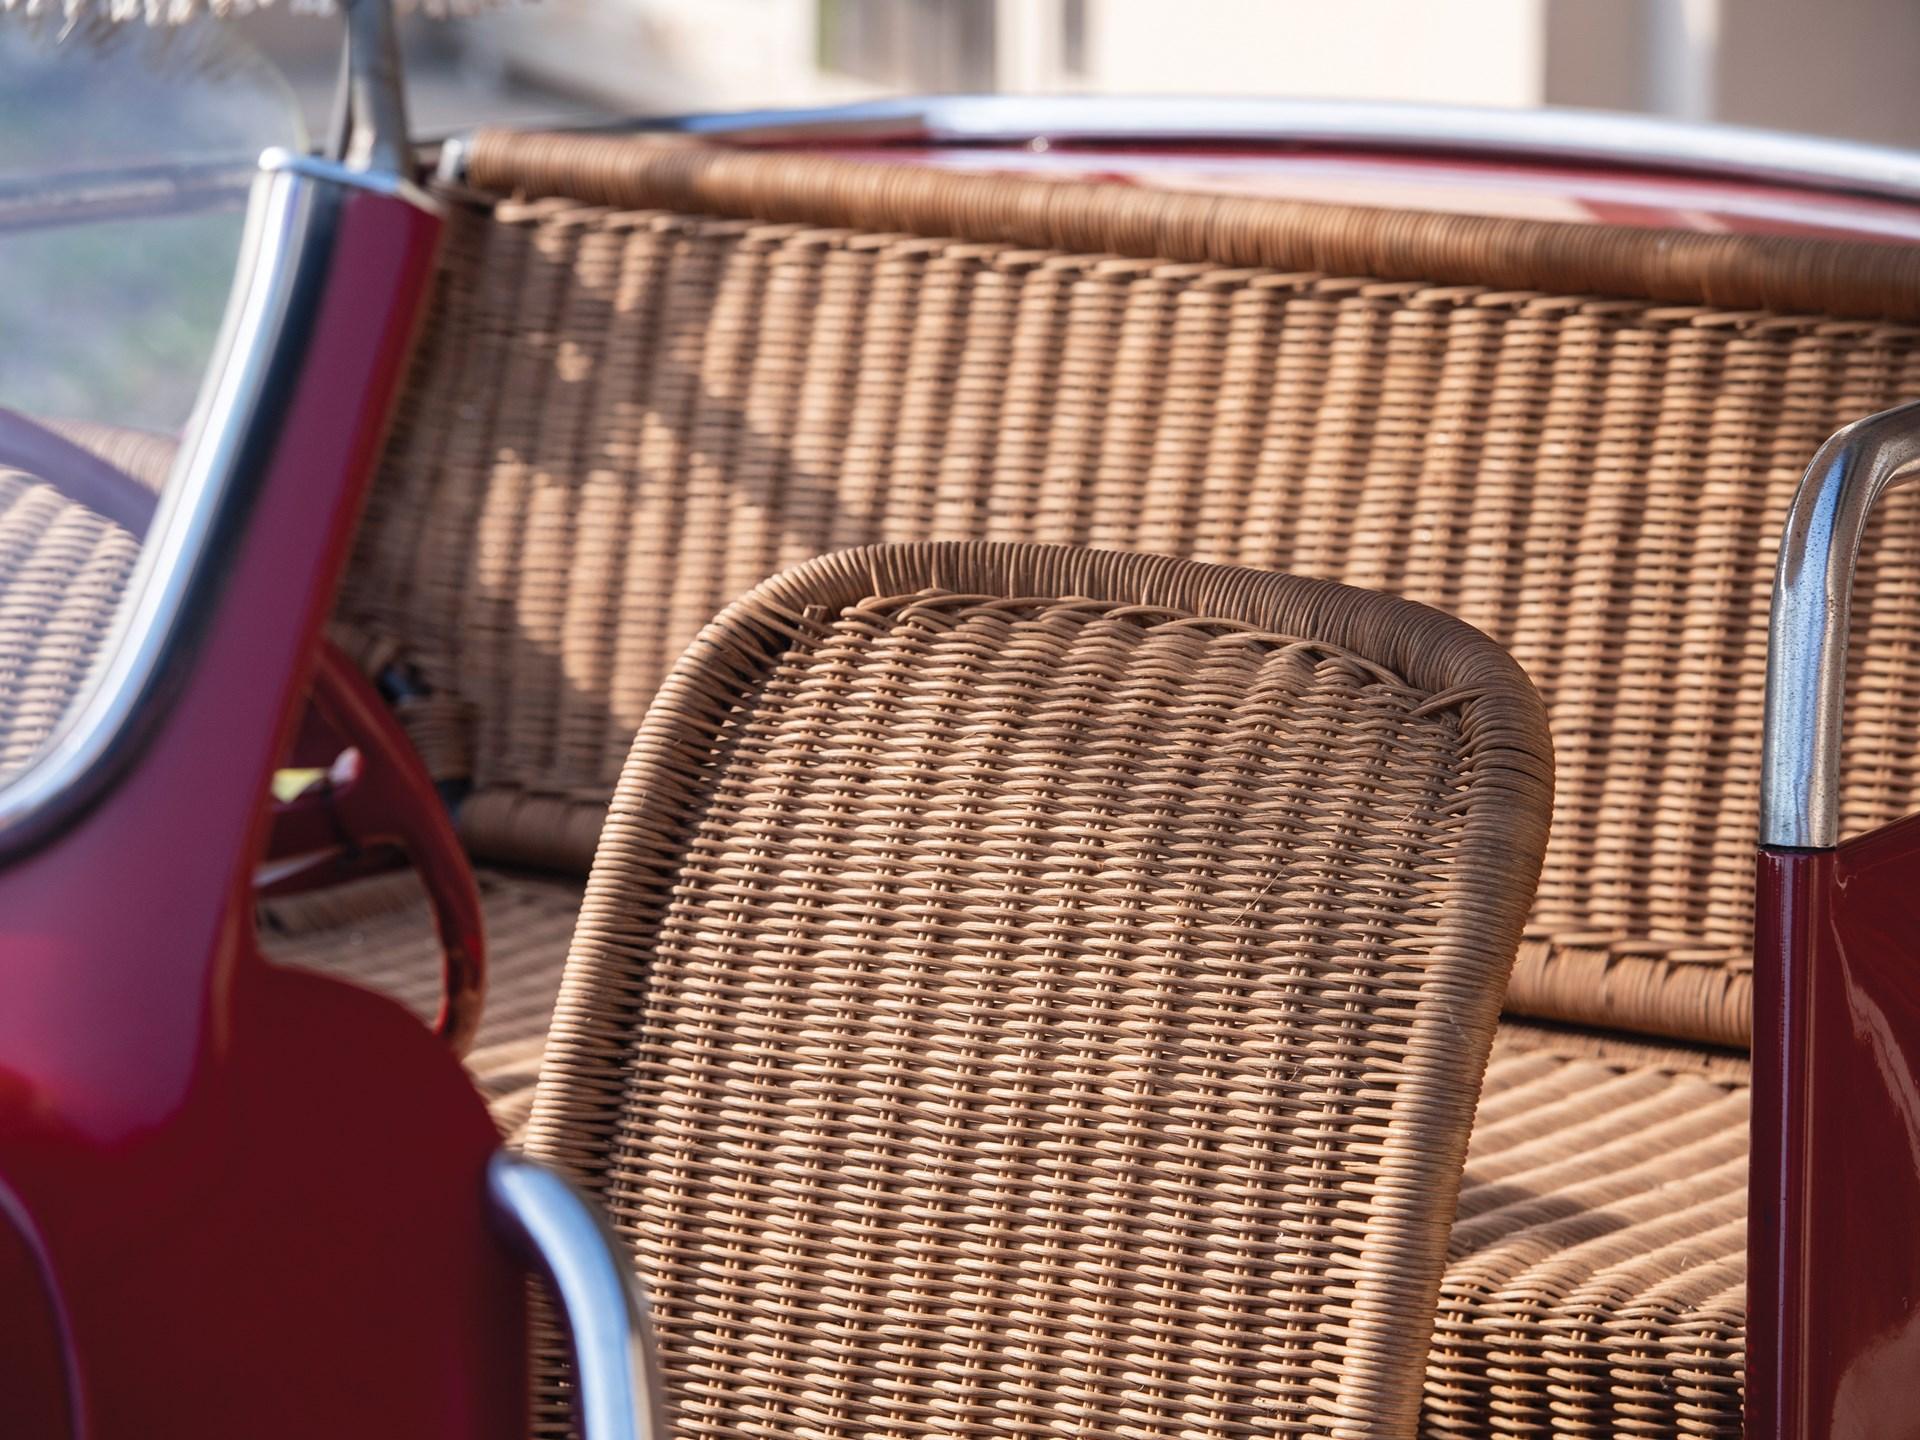 1968 Fiat Jolly seats